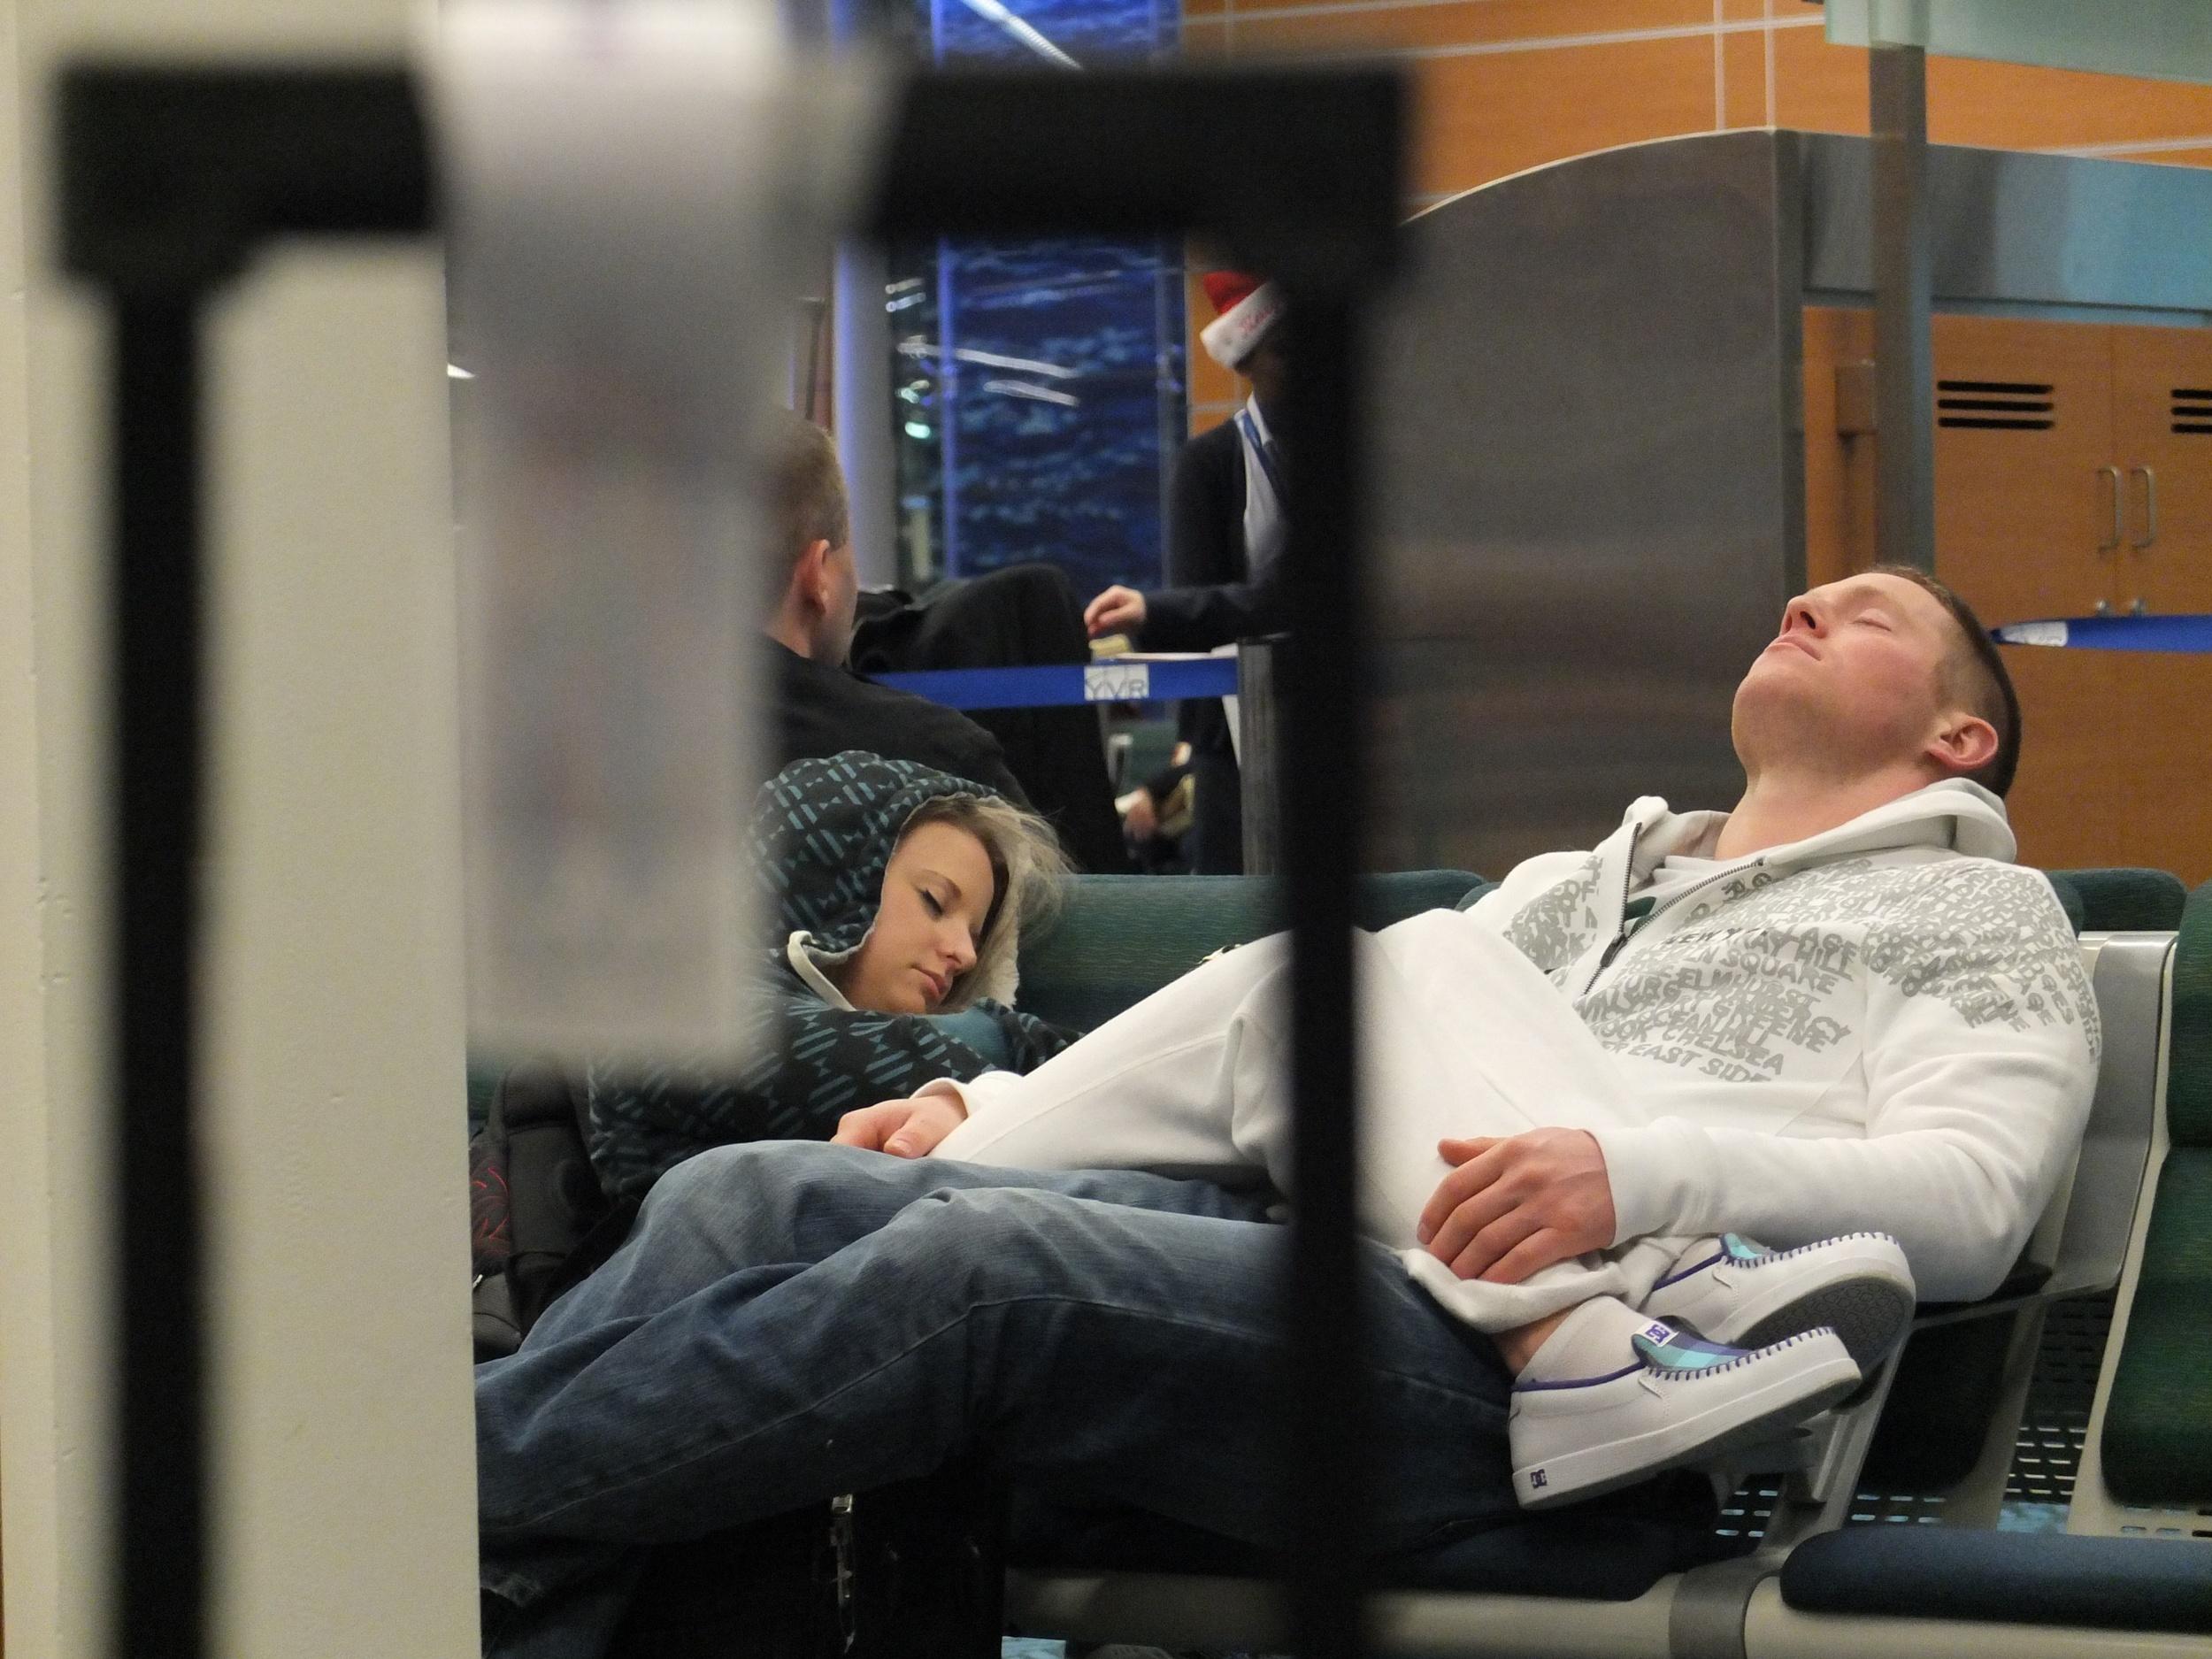 2012-12-25 at 05-12-27 Airport, Exhaustion, Portraits, Sleep, Travel, Uncomfortable.jpg